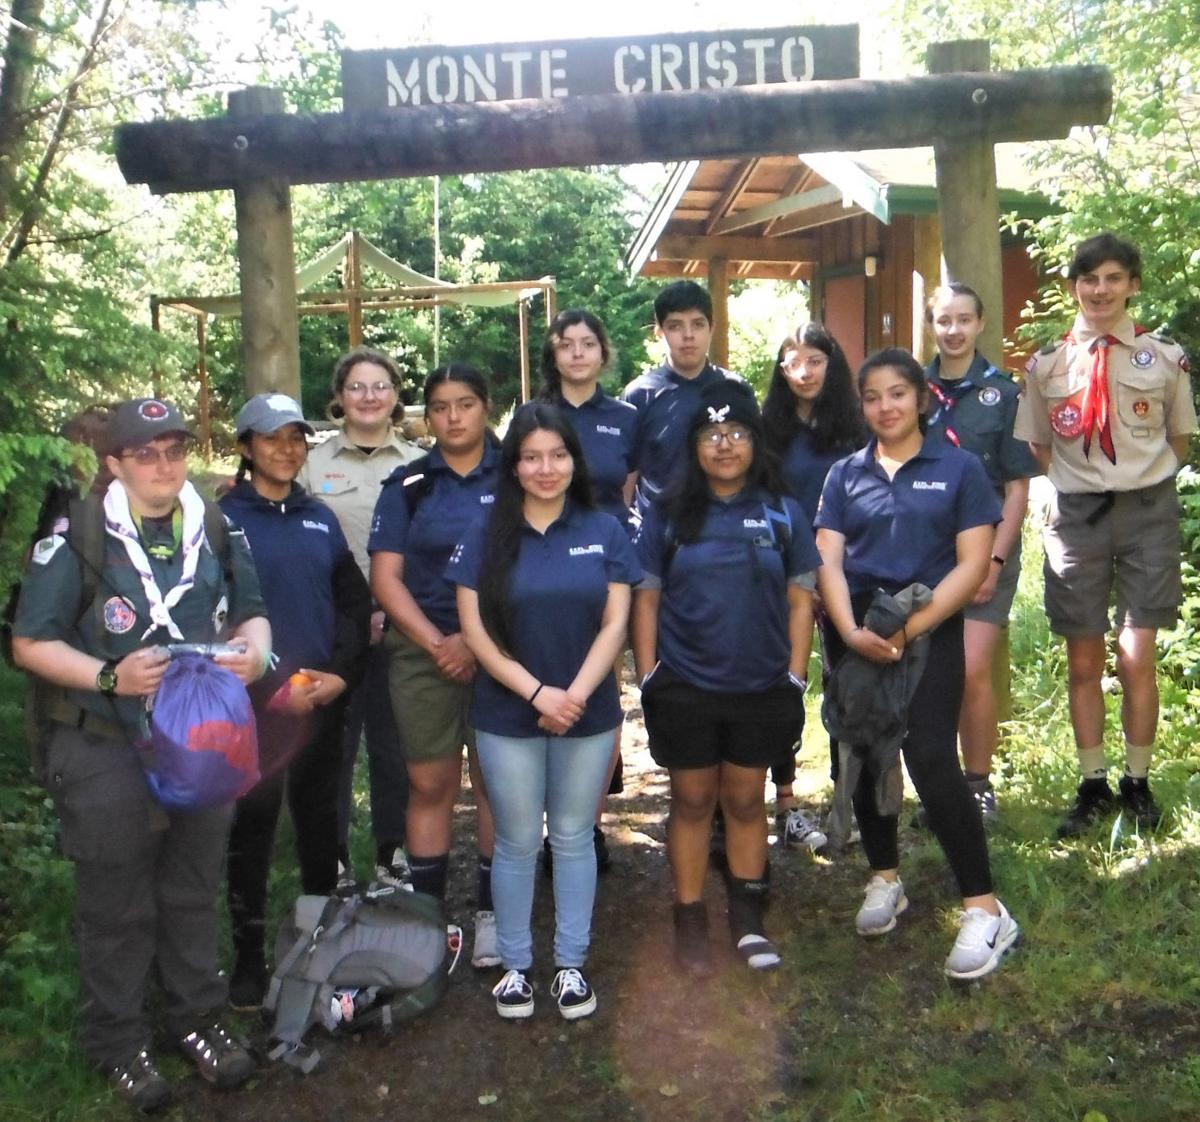 190609 Scout Jamboree Monte Cristo sign.jpg